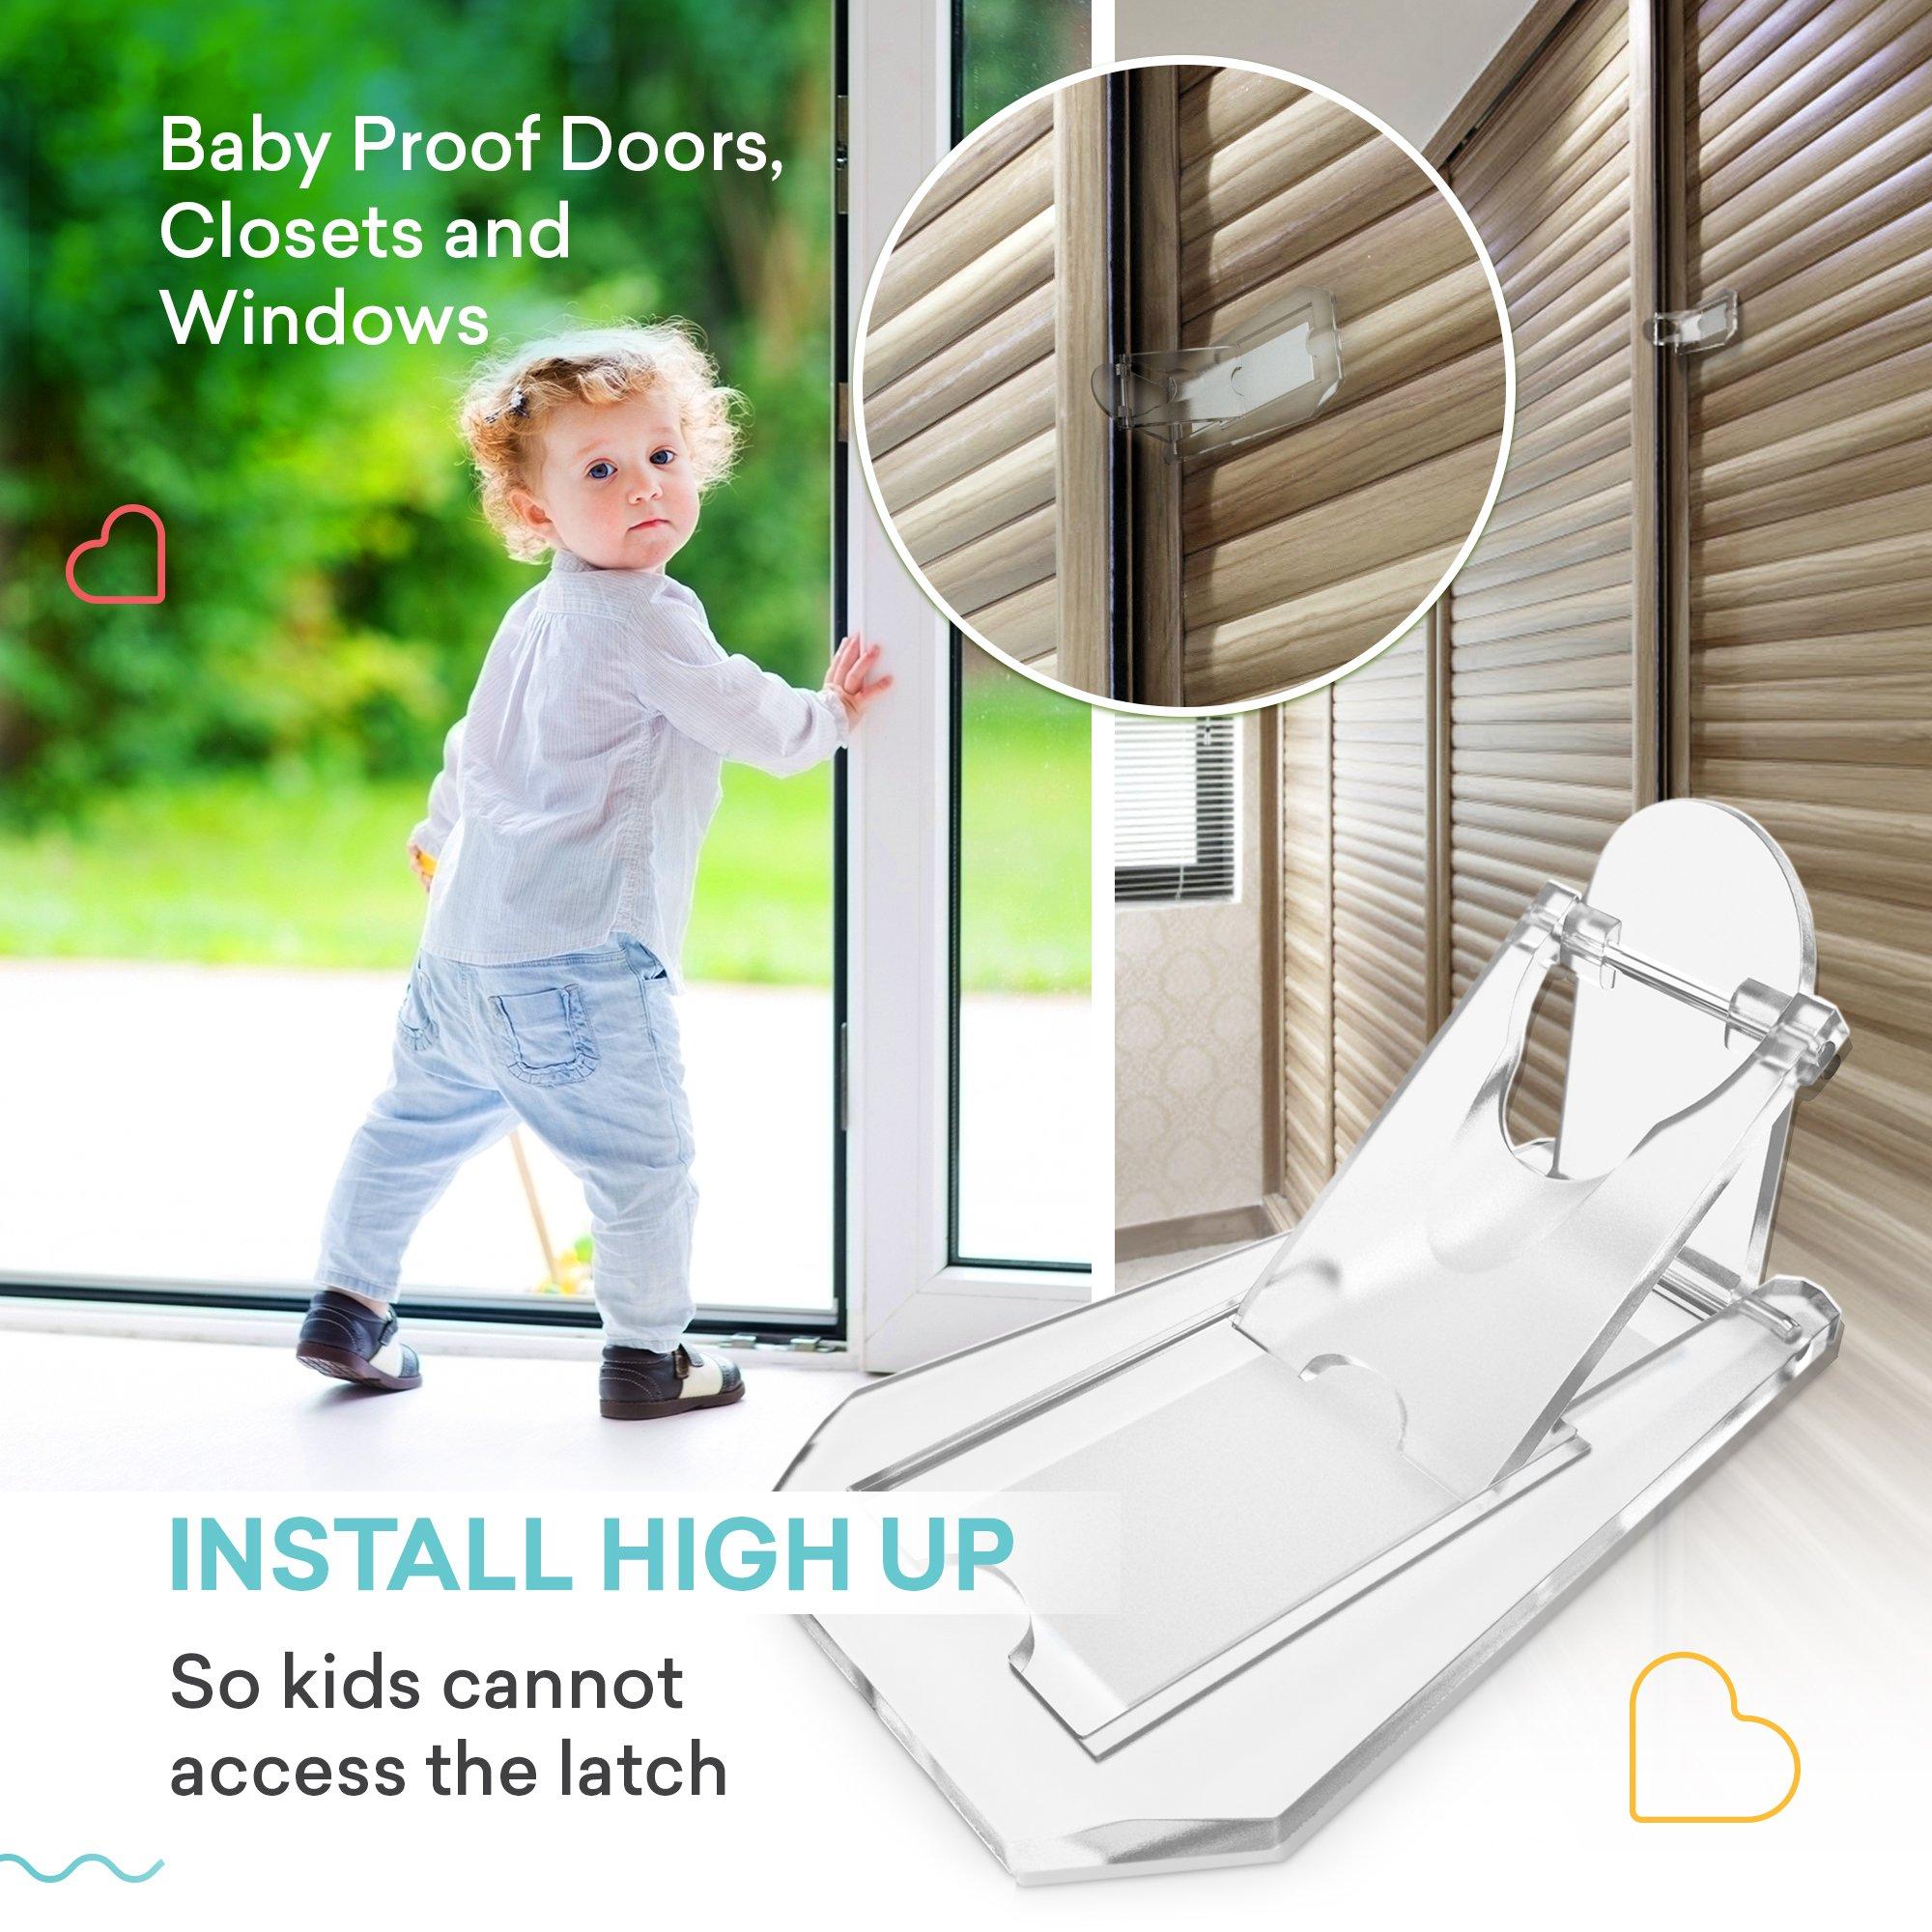 sliding door lock baby proof closets window locks for children clear 4 pack 627843629702 ebay. Black Bedroom Furniture Sets. Home Design Ideas